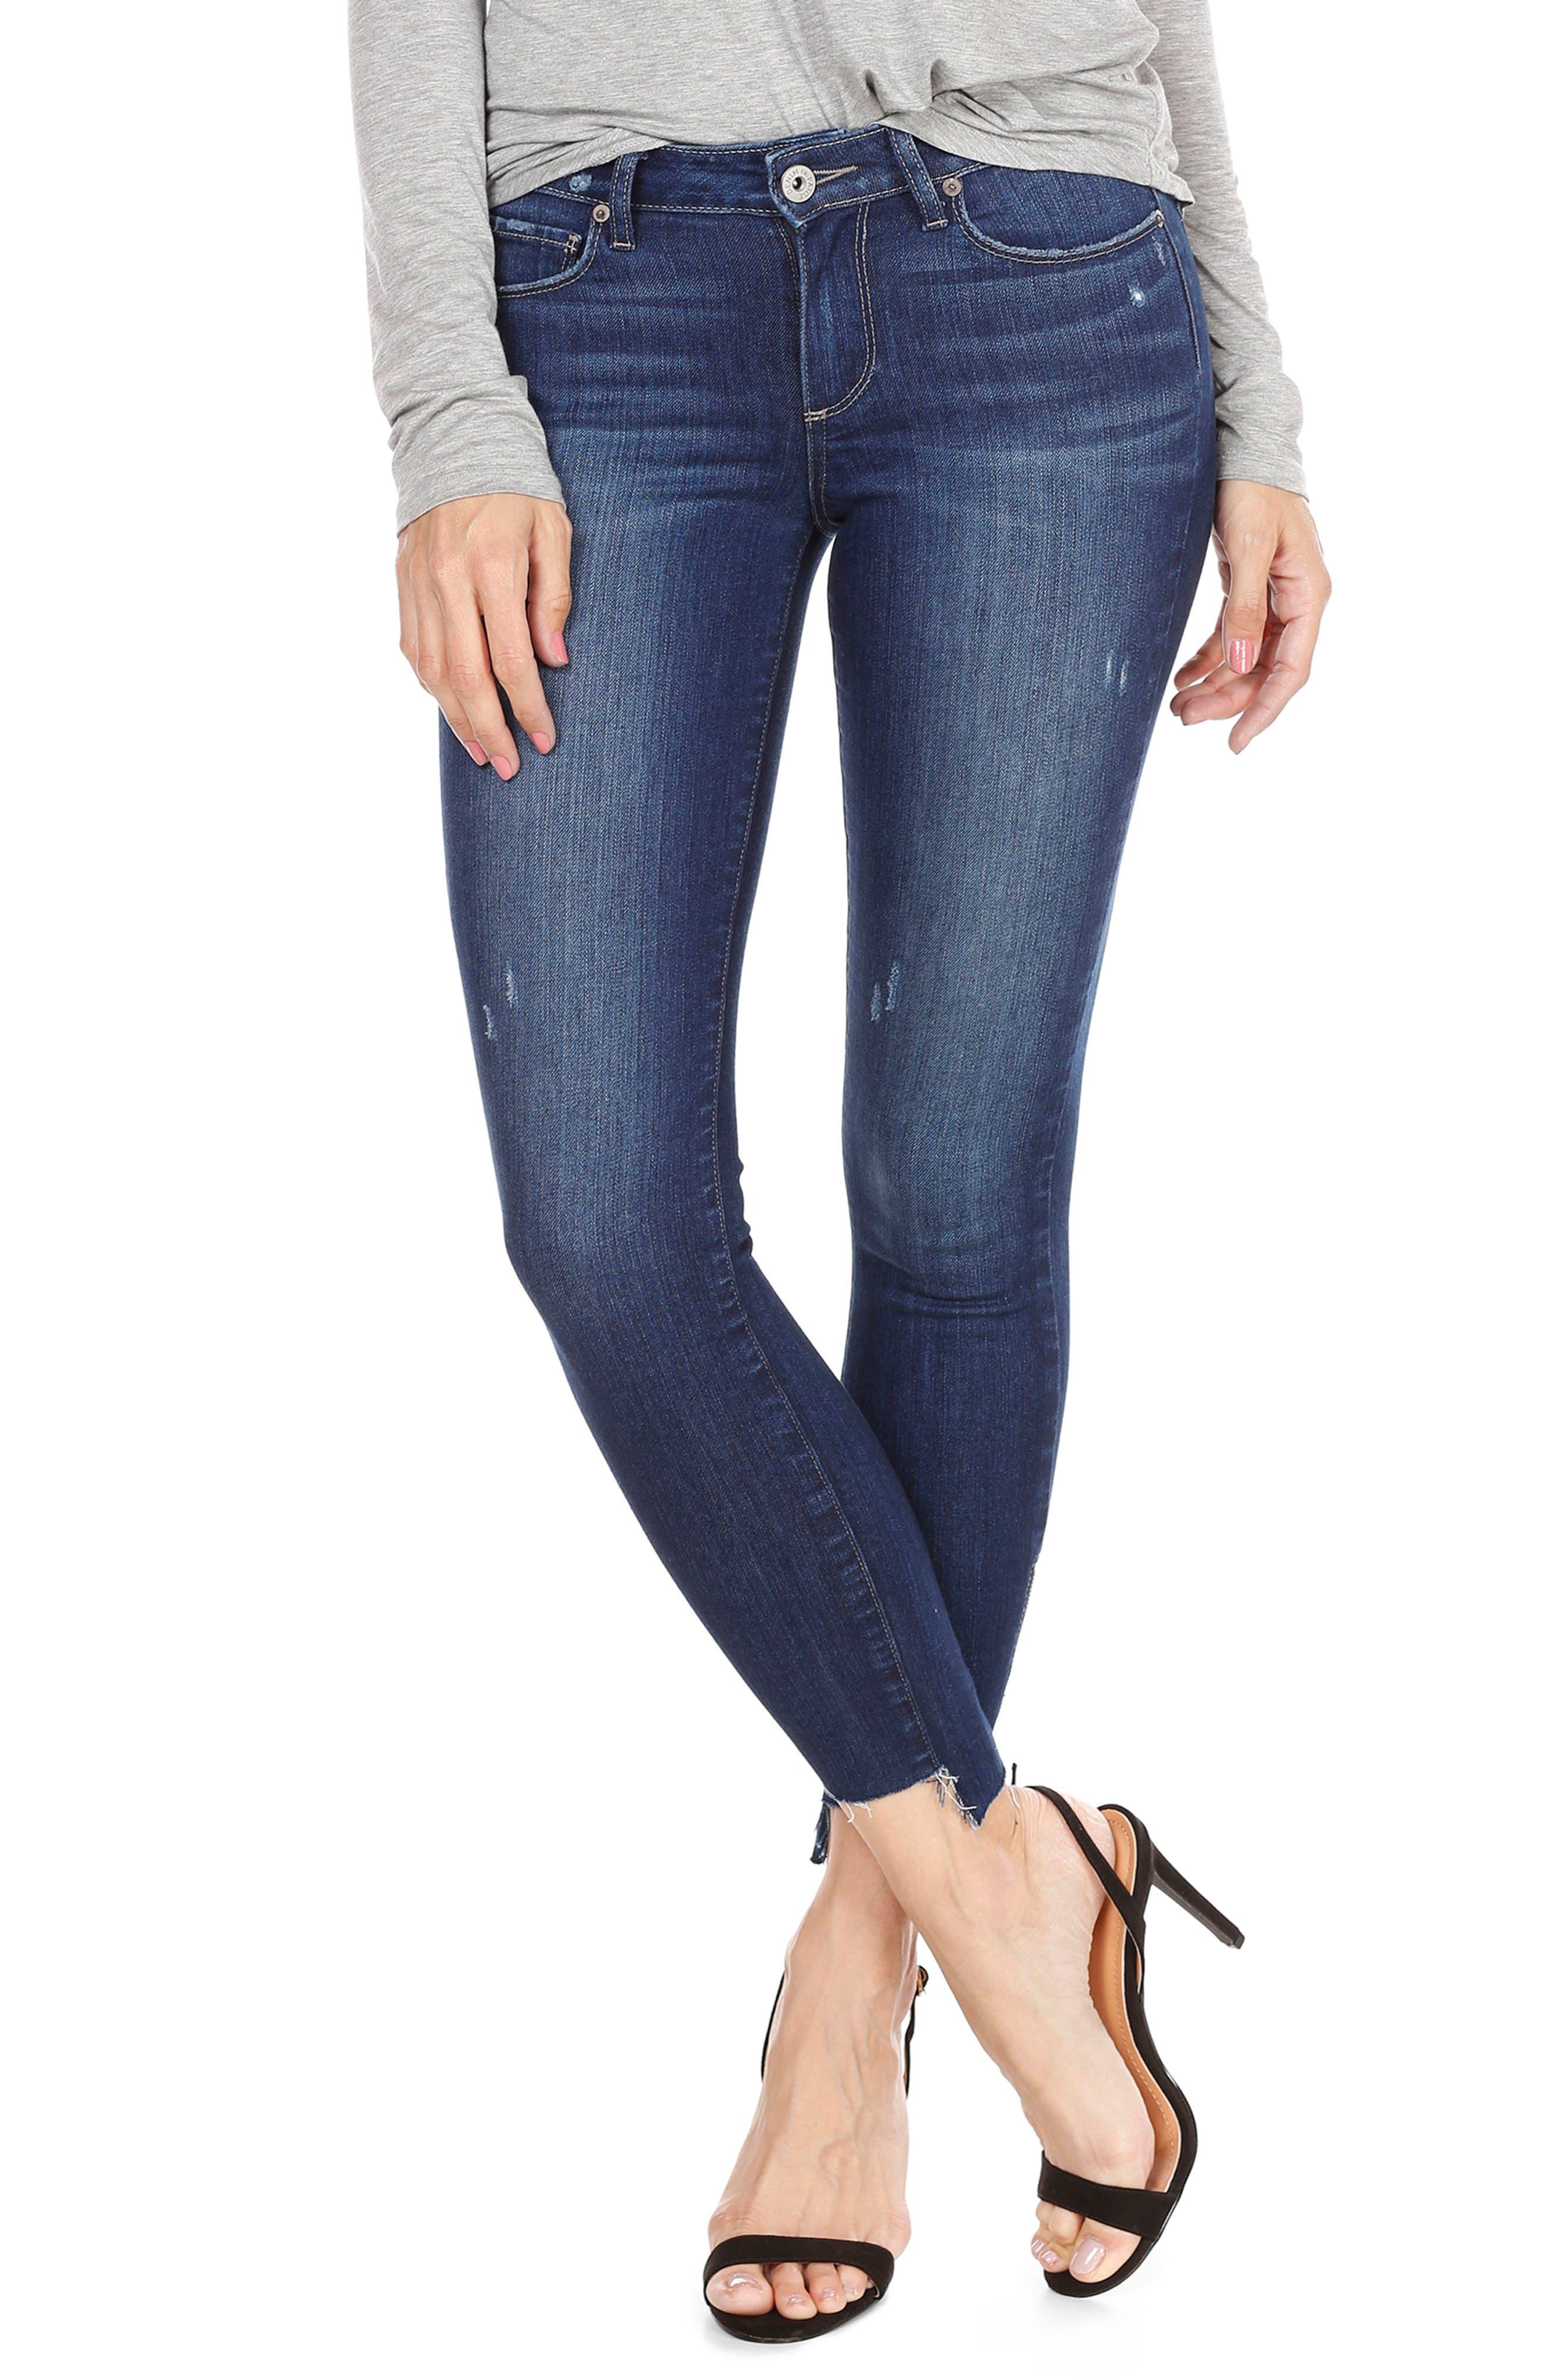 Hoxton High Waist Ankle Skinny Jeans,                             Alternate thumbnail 3, color,                             Marina